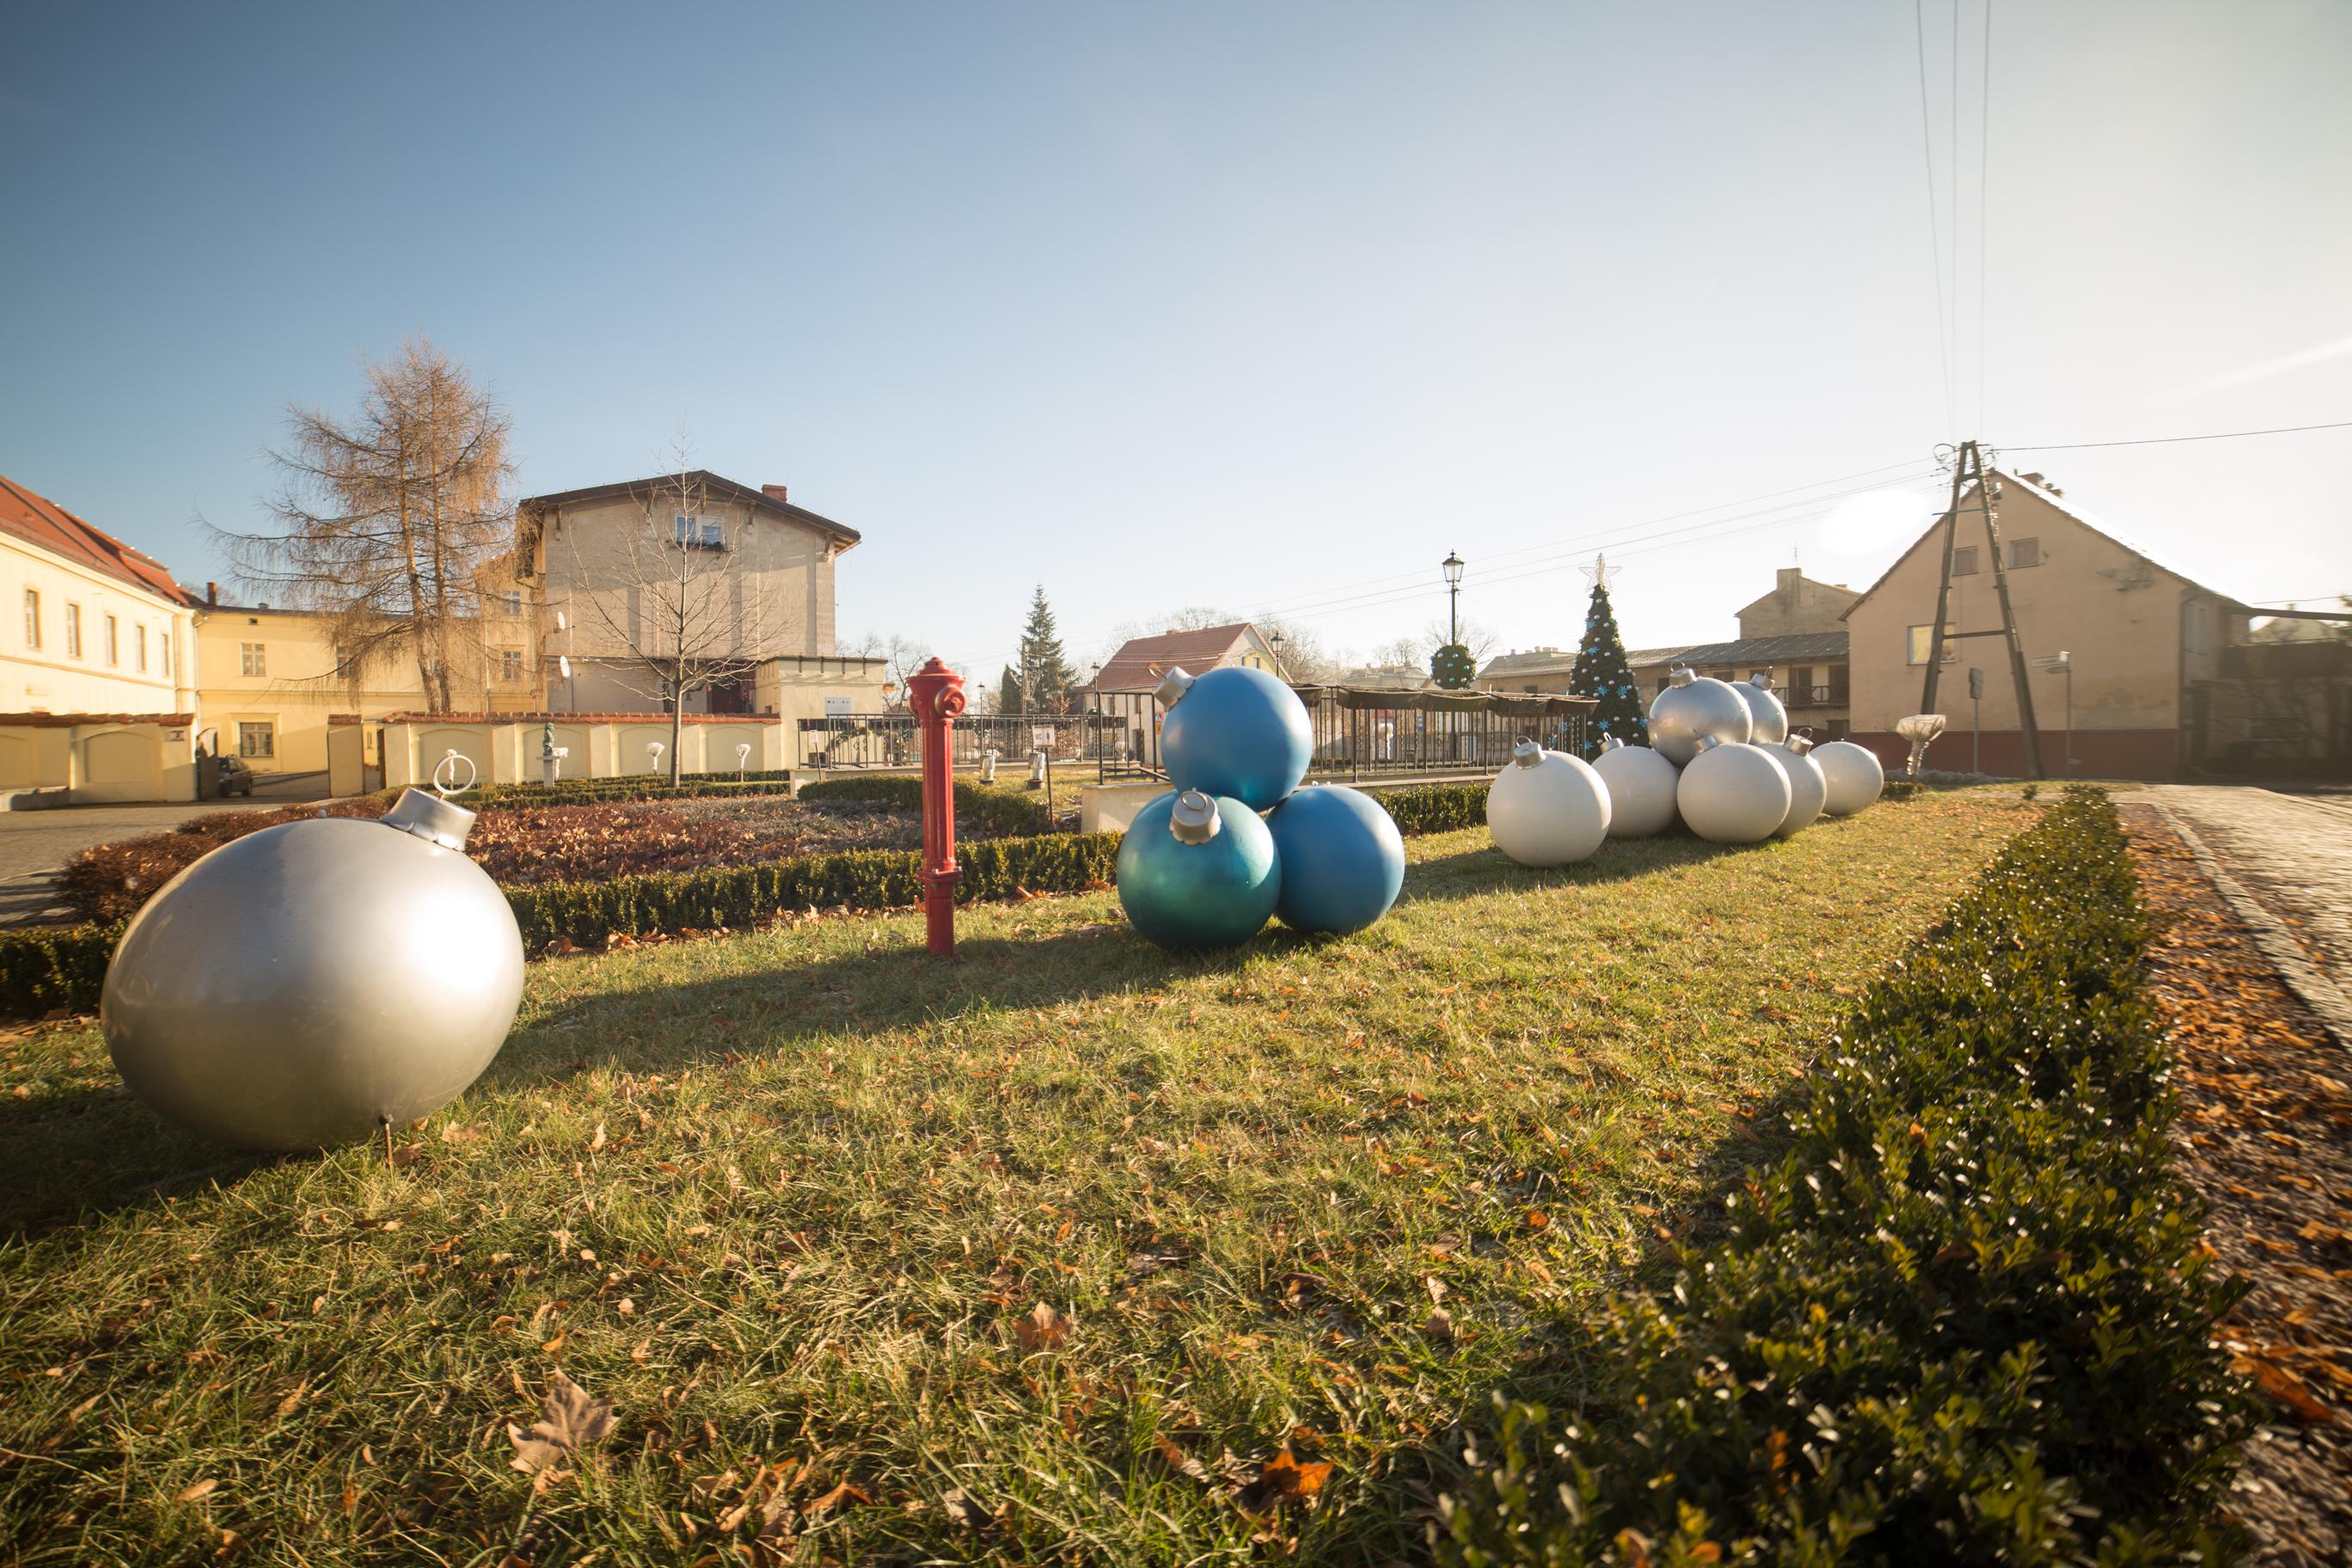 Legnickie Pole bombki xxl terrachristmas (6)